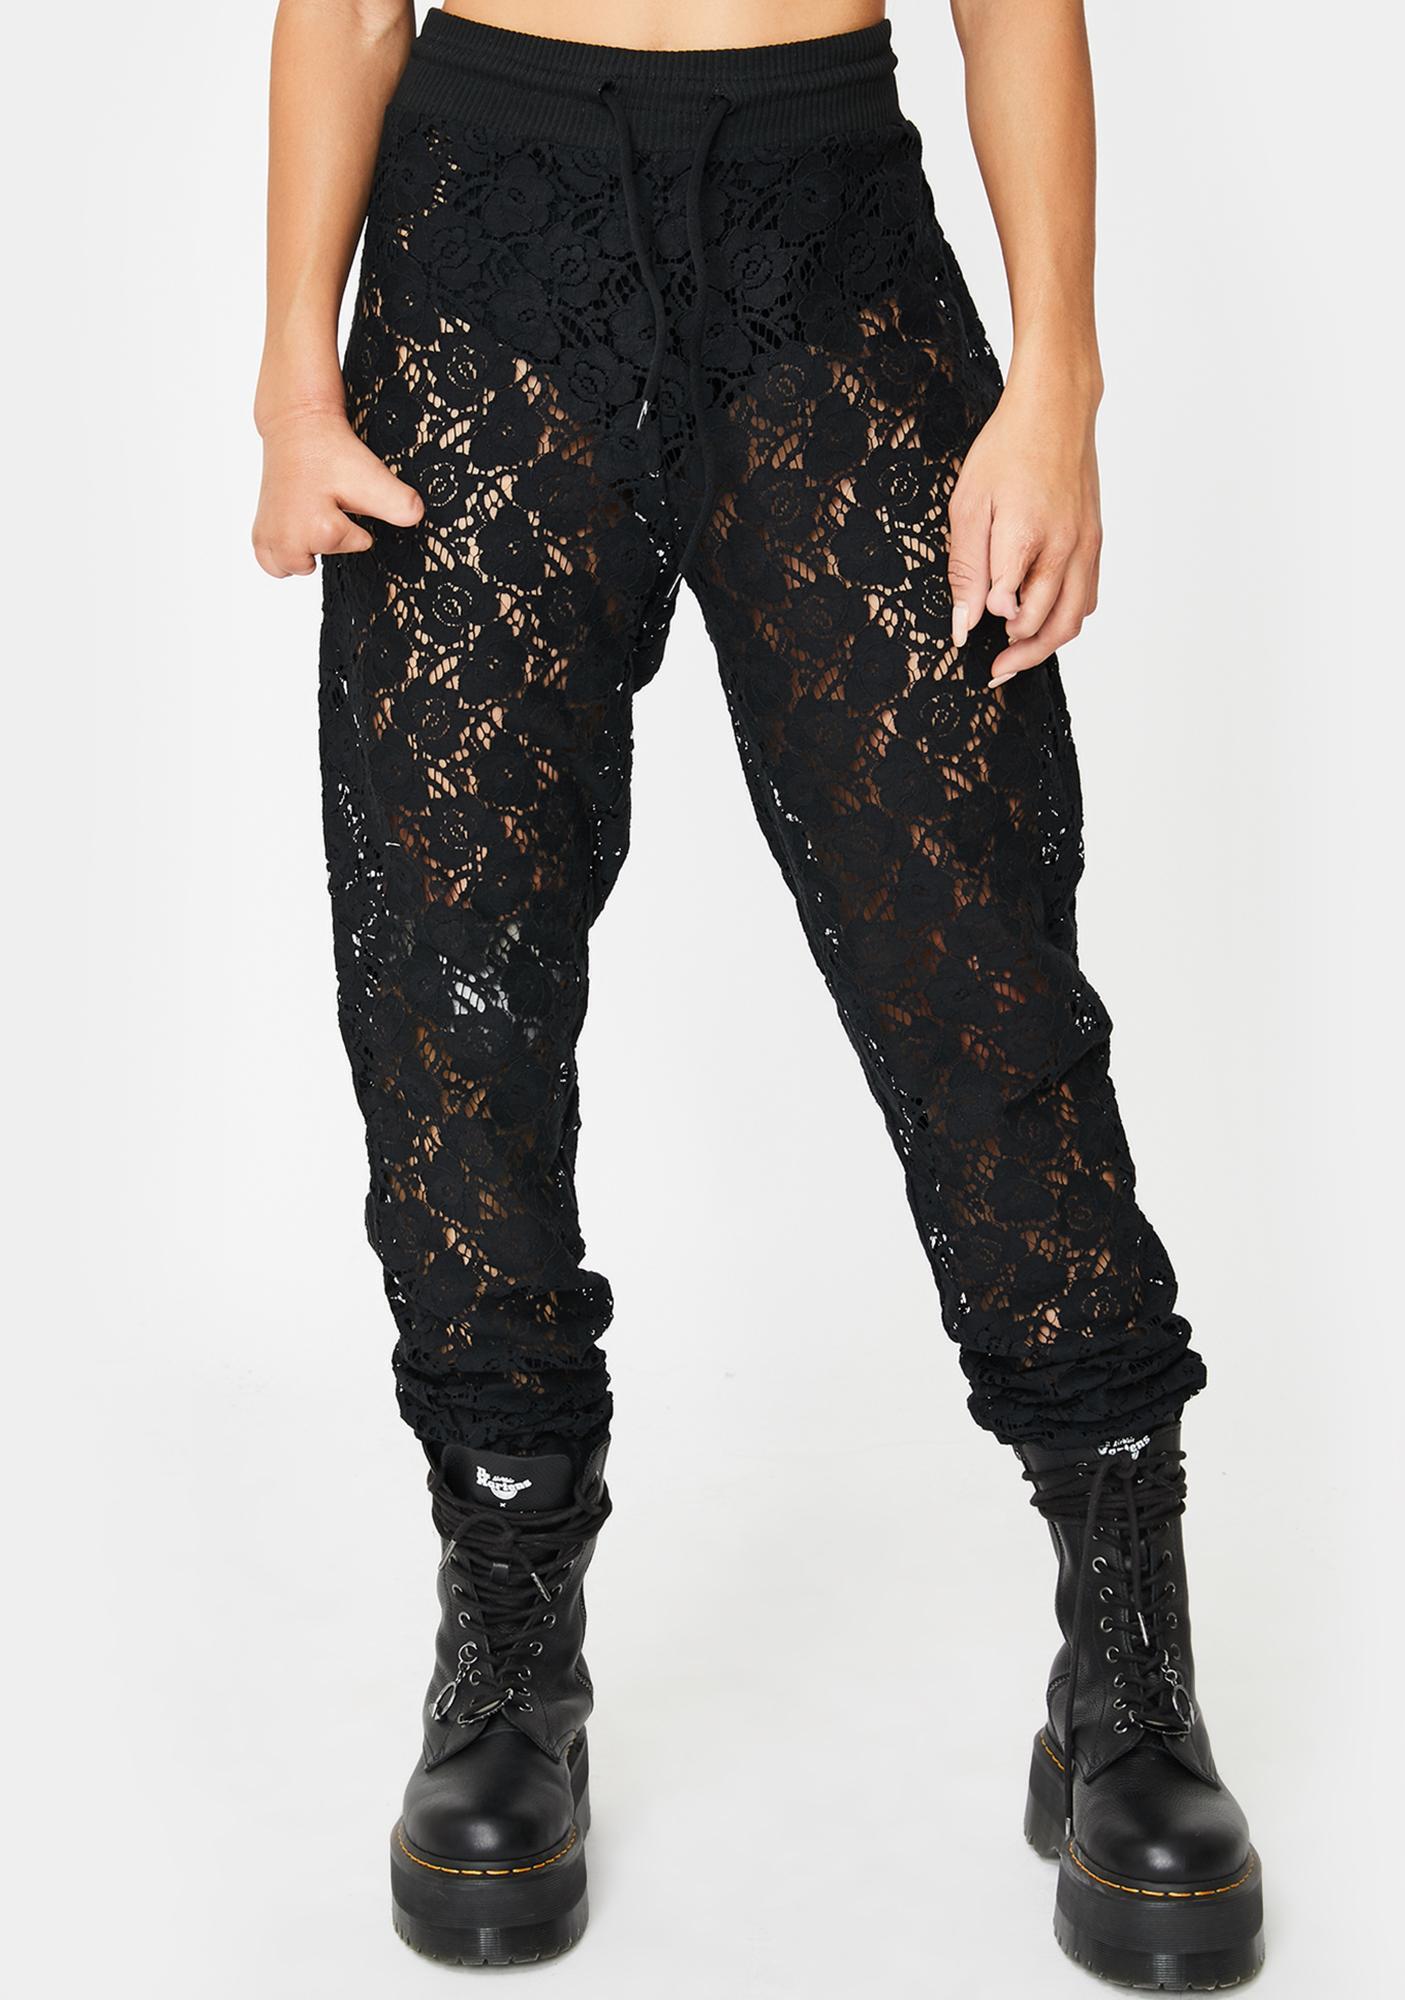 Kiki Riki Exposed Elegance Lace Joggers